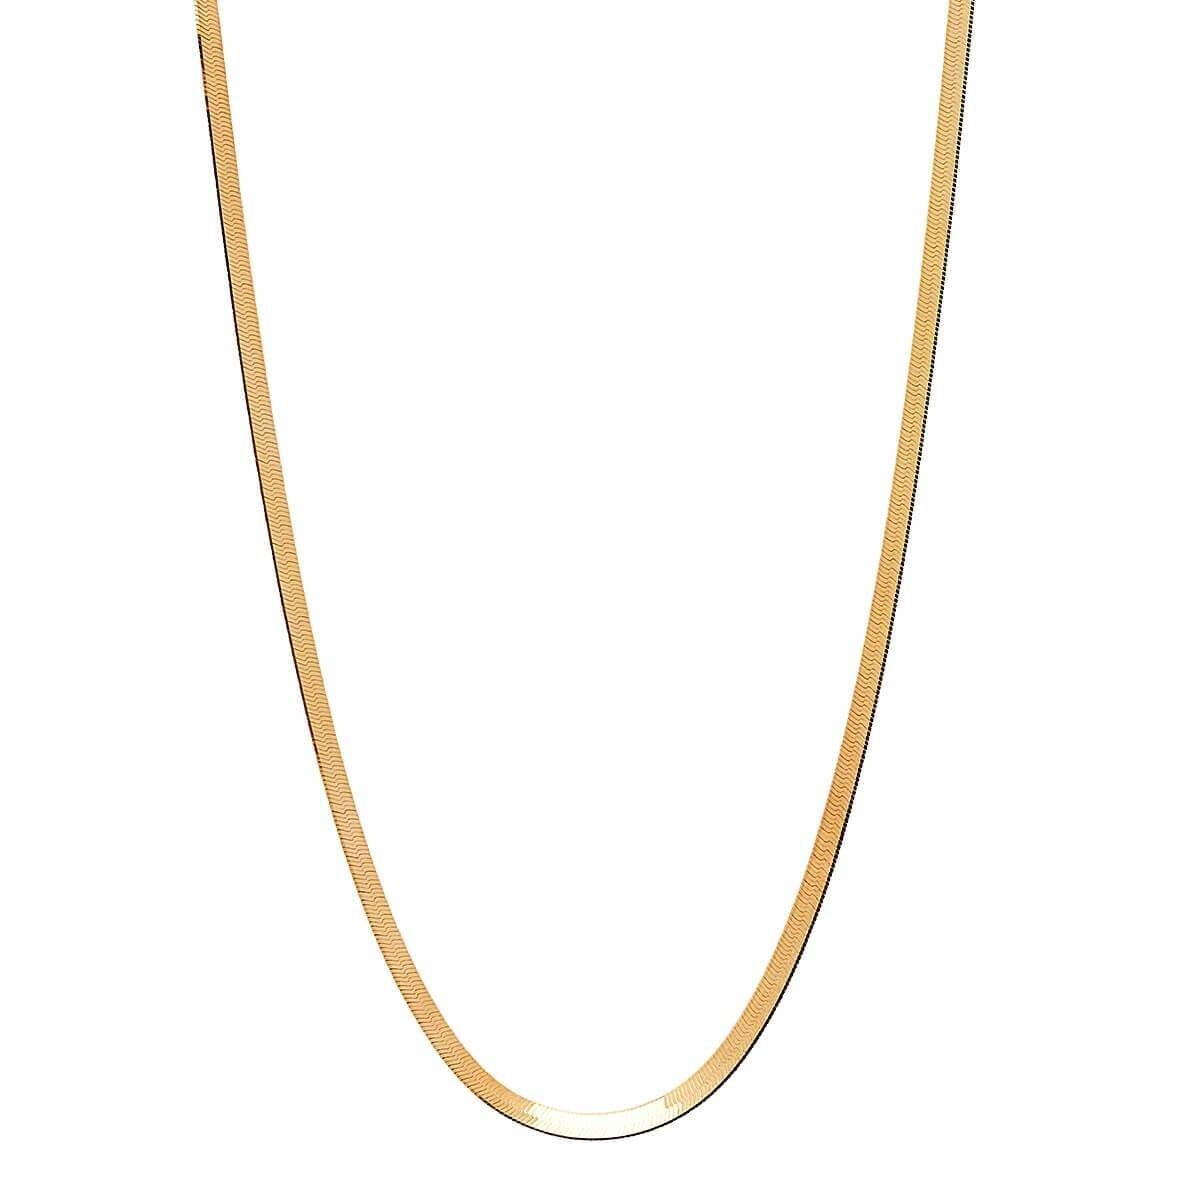 Najo - Herringbone Yellow Gold Necklace